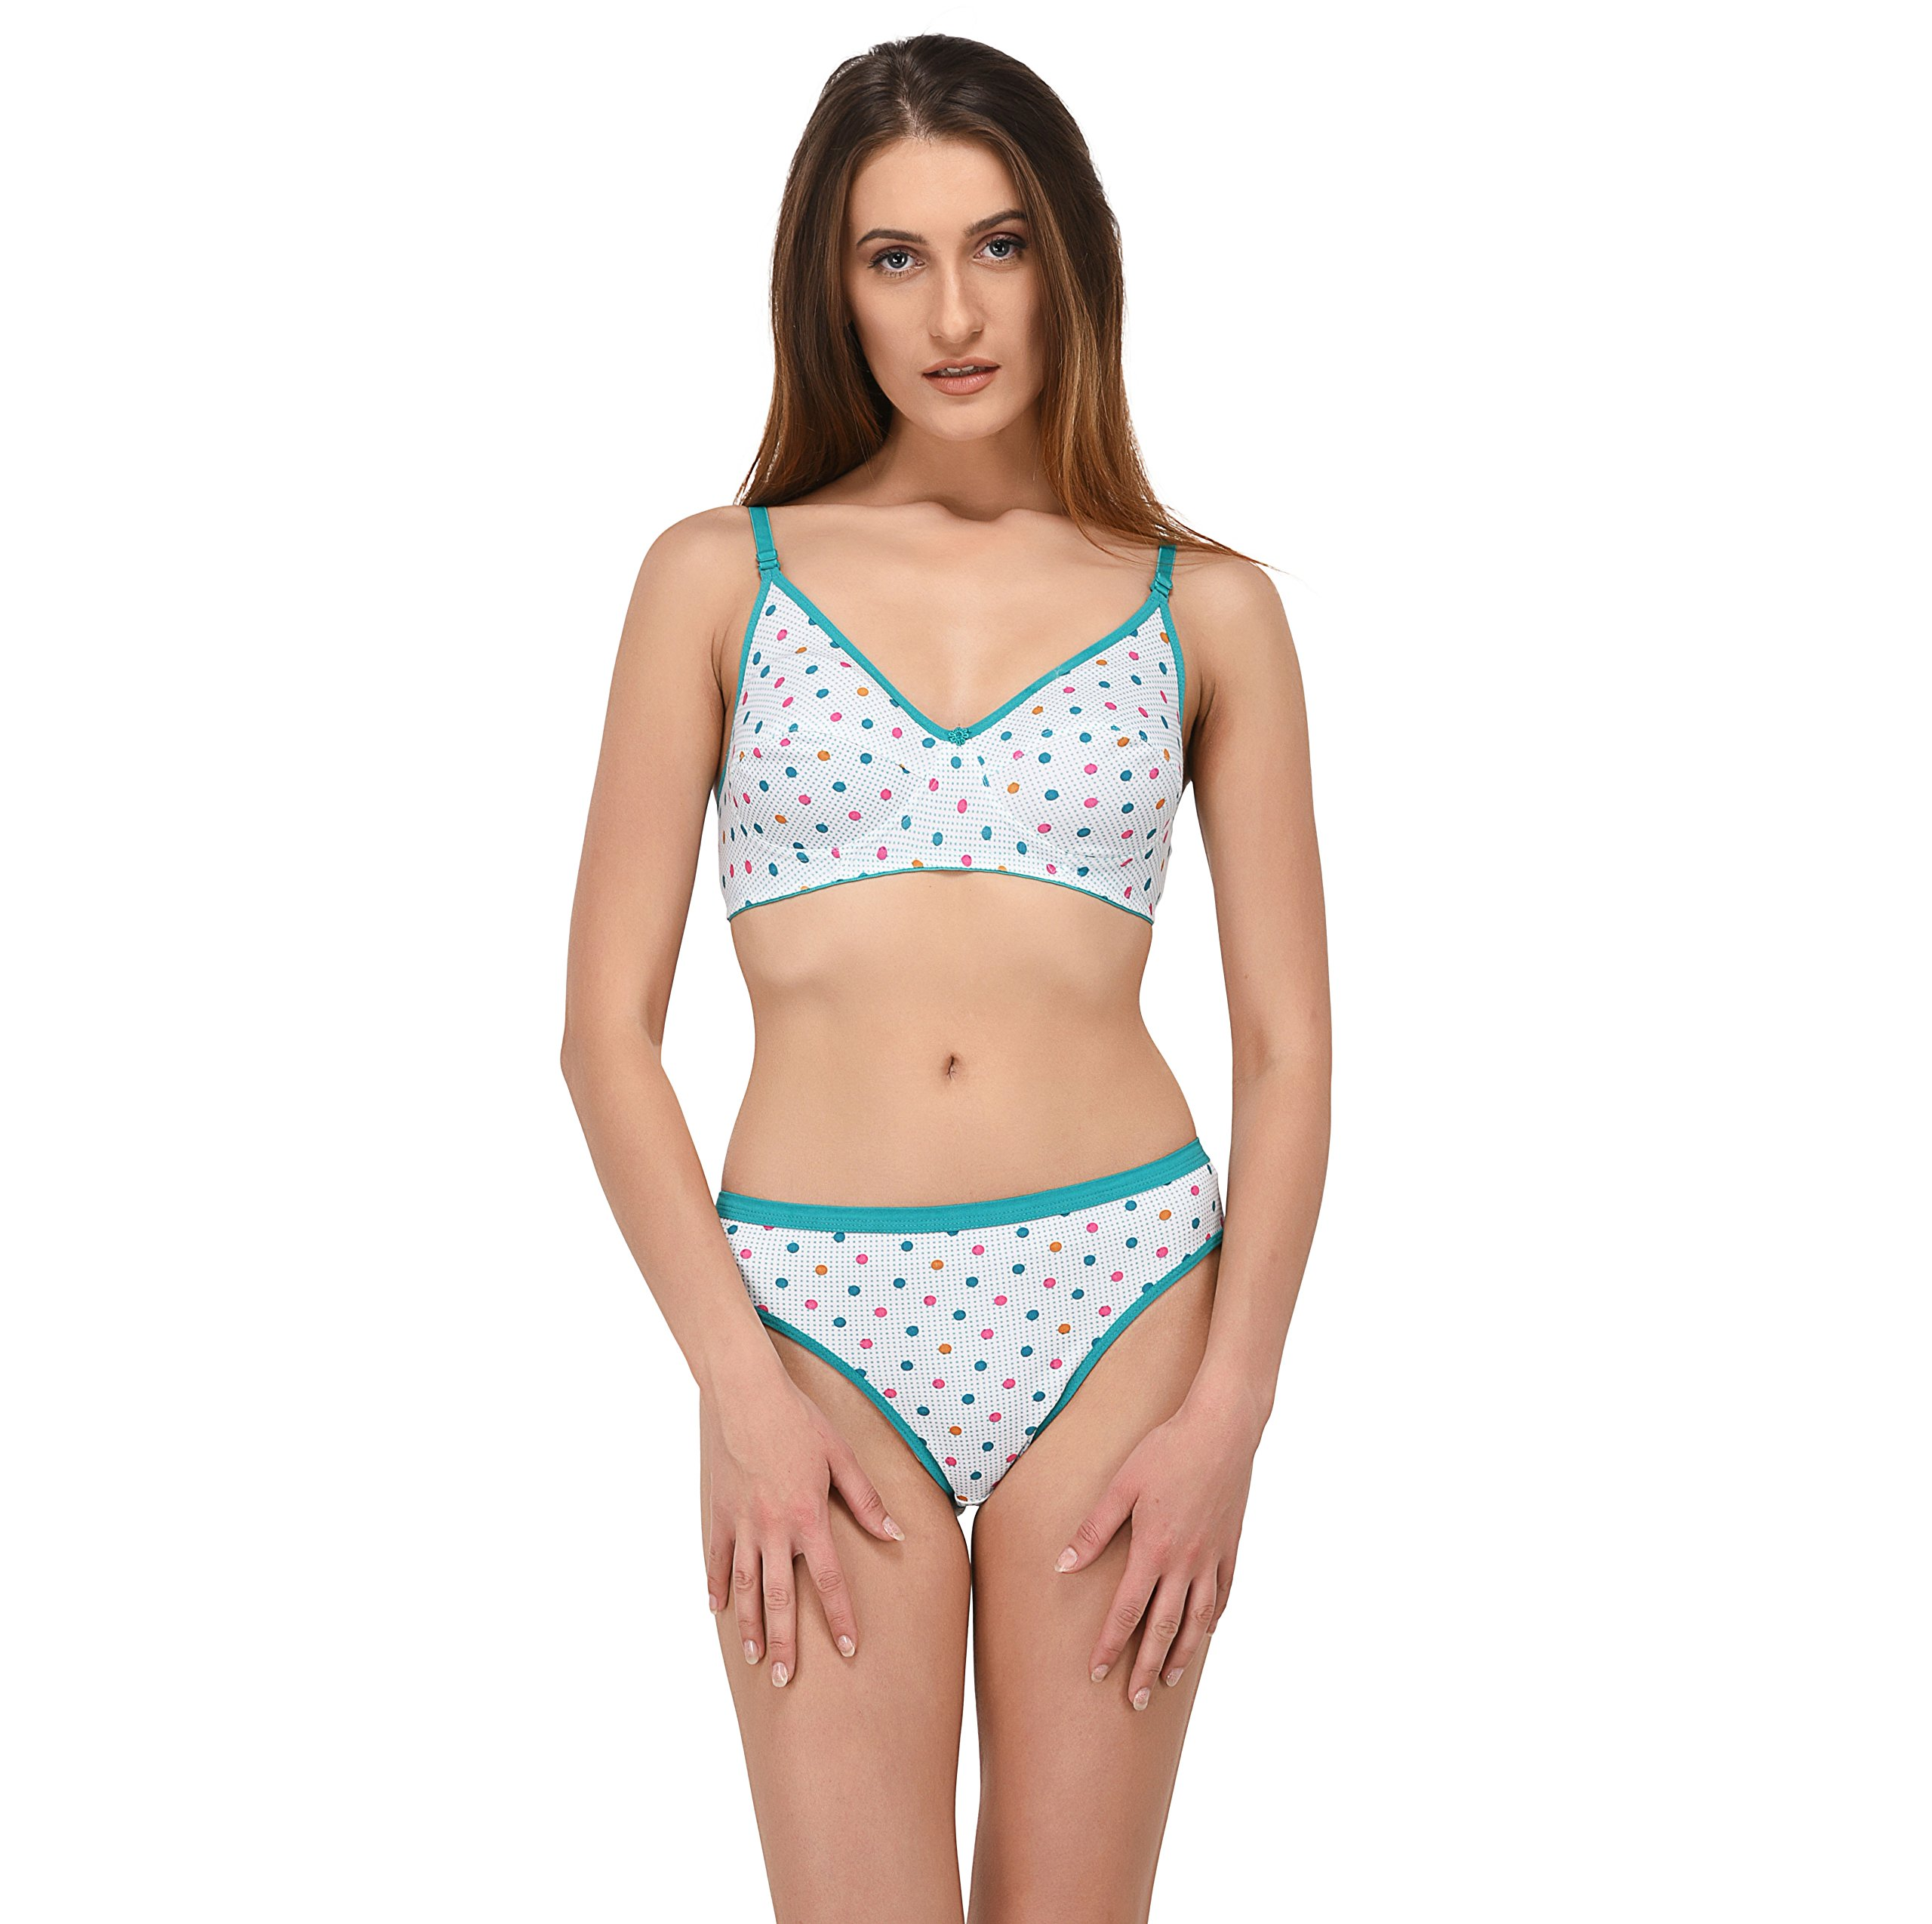 Elina Women s Green B-Cup Hosery Polka Dots Bra   Panty Set. (Set of ... ebf7fb98e